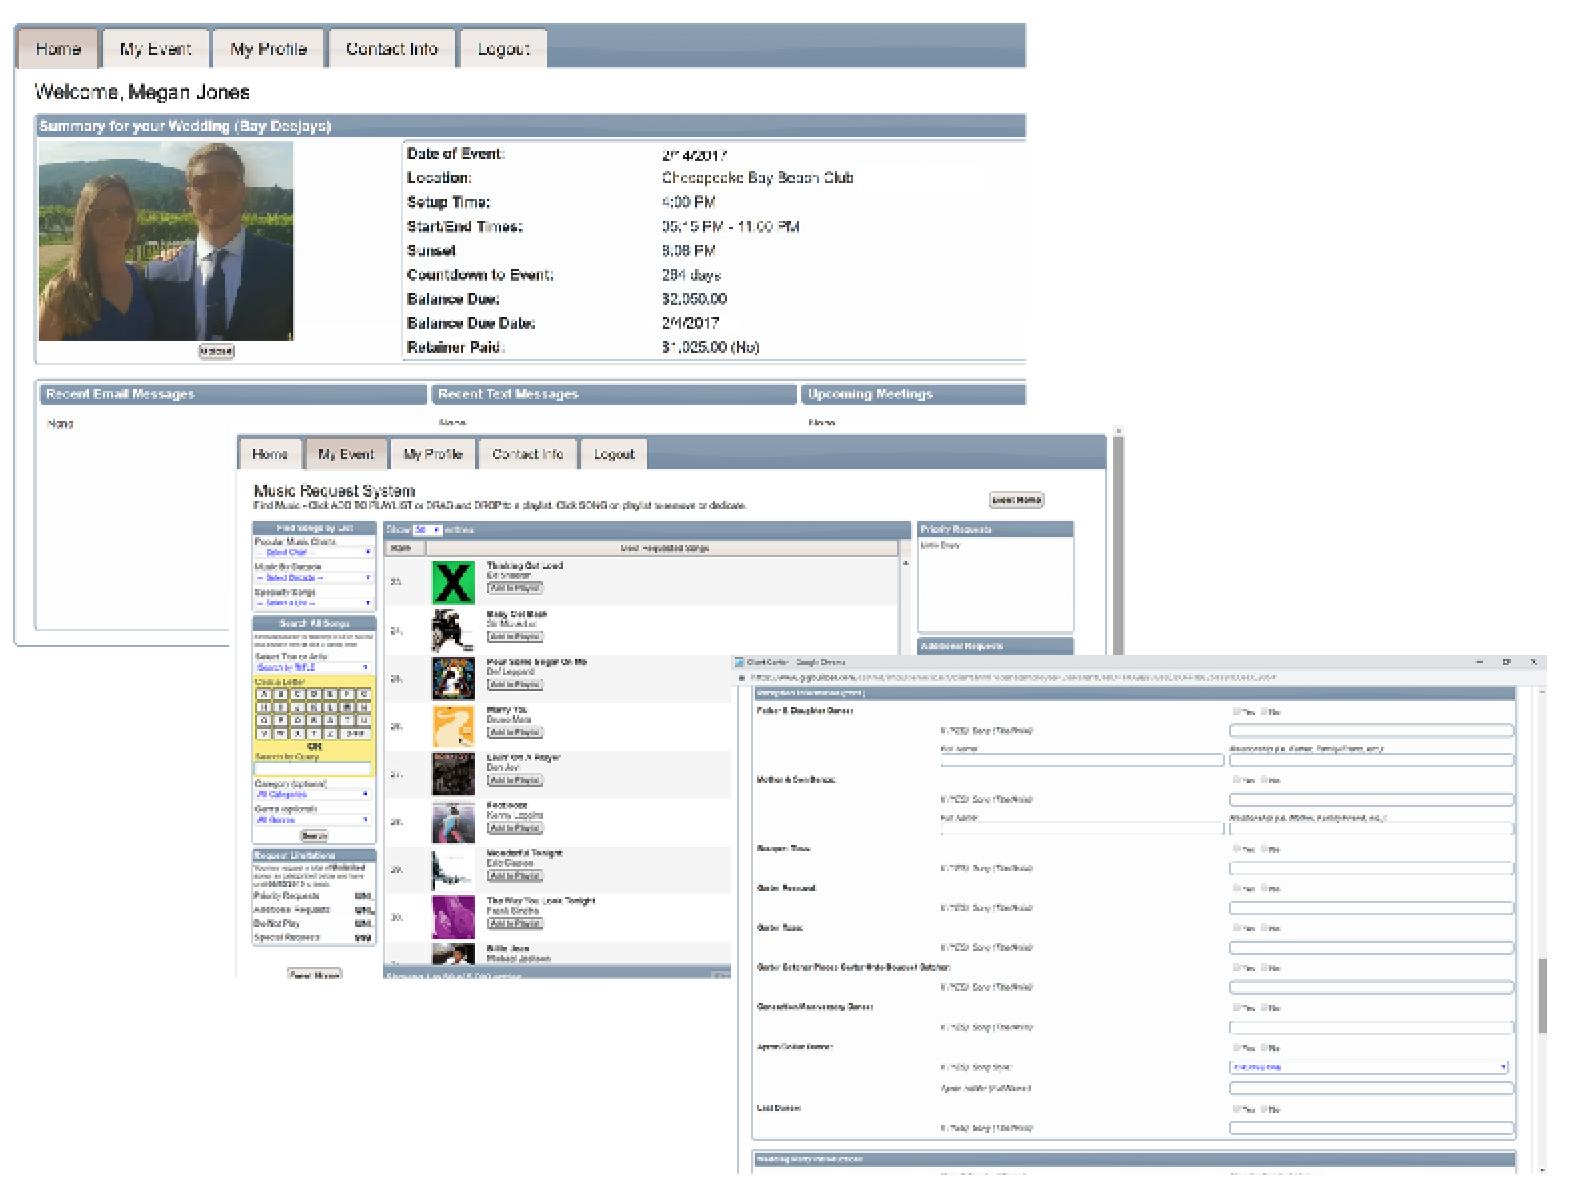 online-dj-planner.jpg